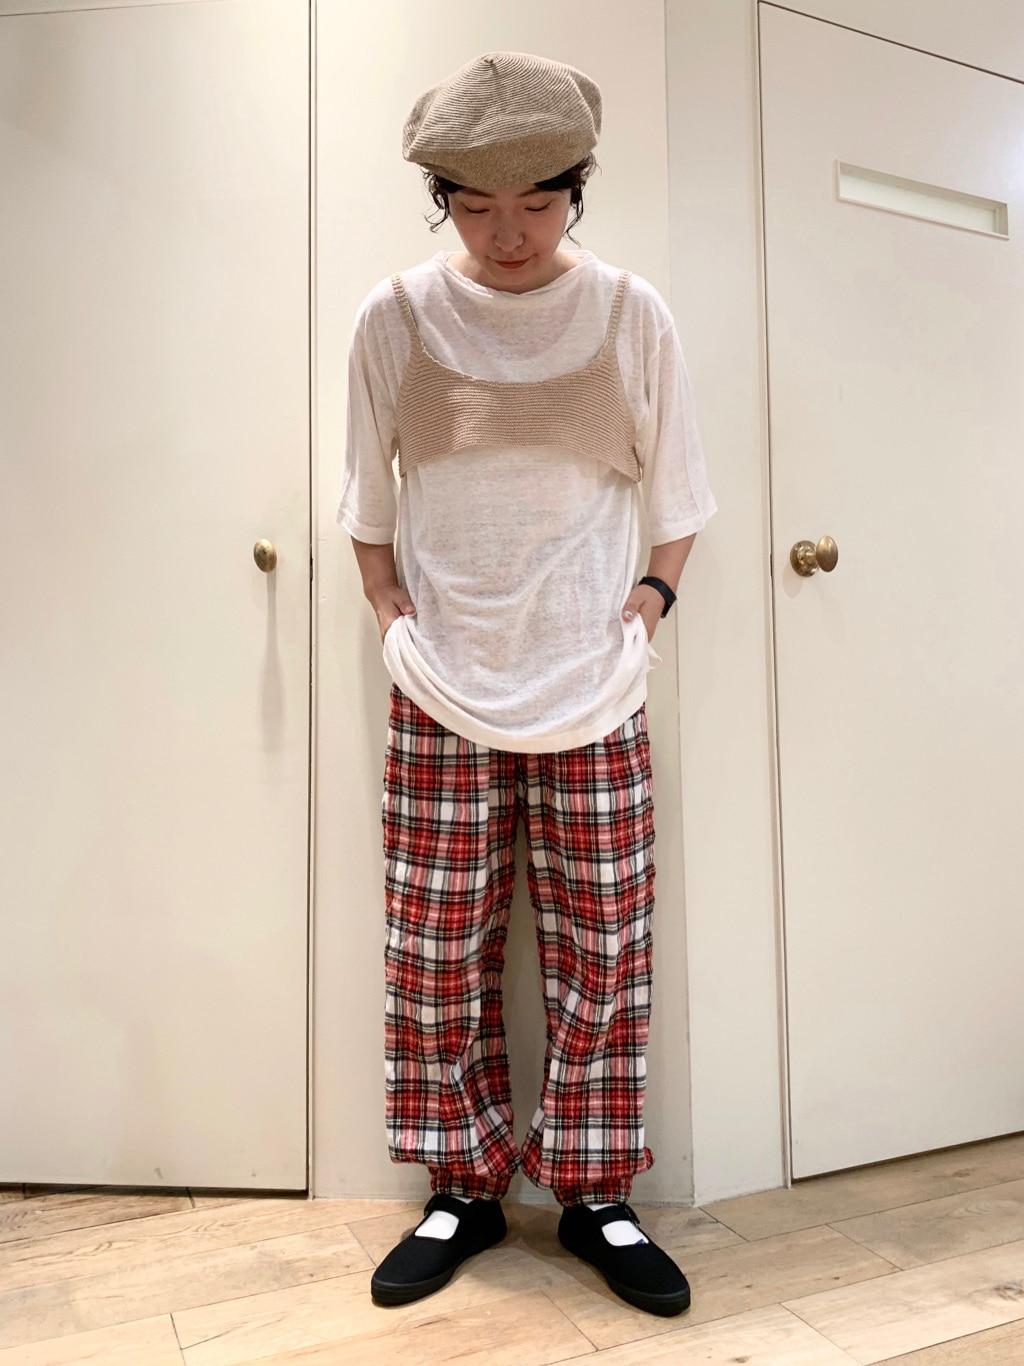 bulle de savon 新宿ミロード 身長:159cm 2020.07.30